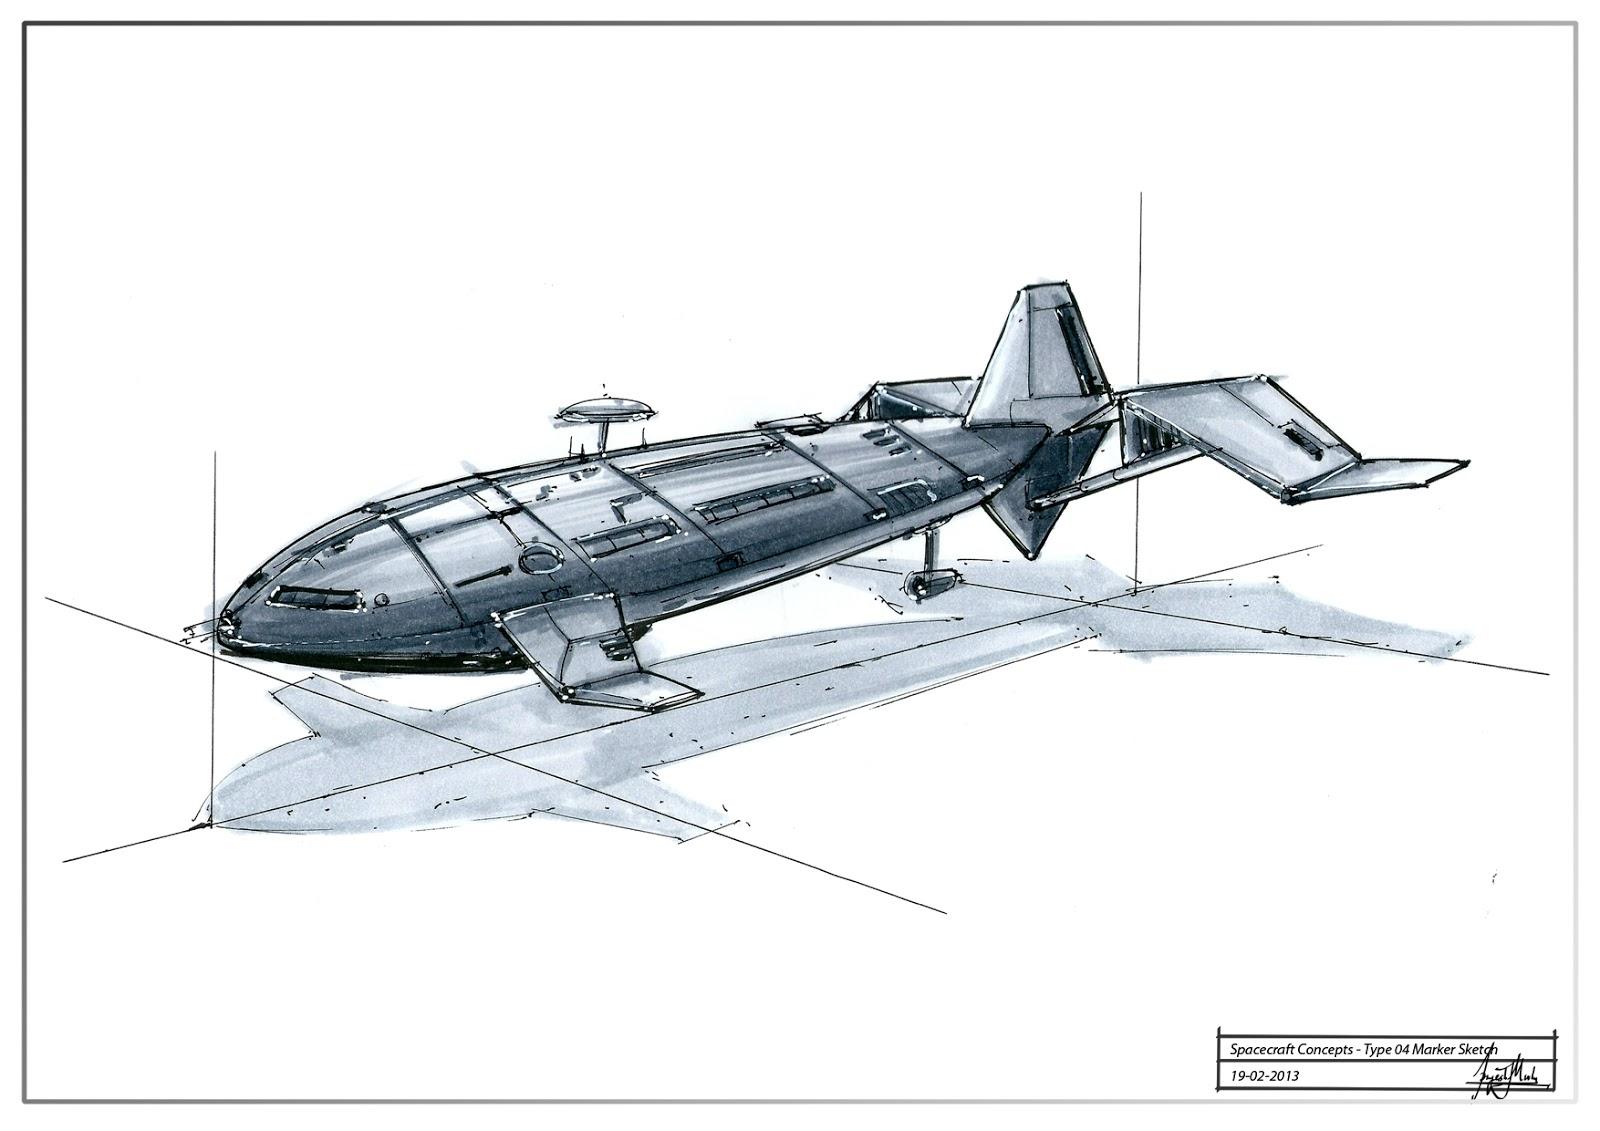 spacecraft concept - photo #12